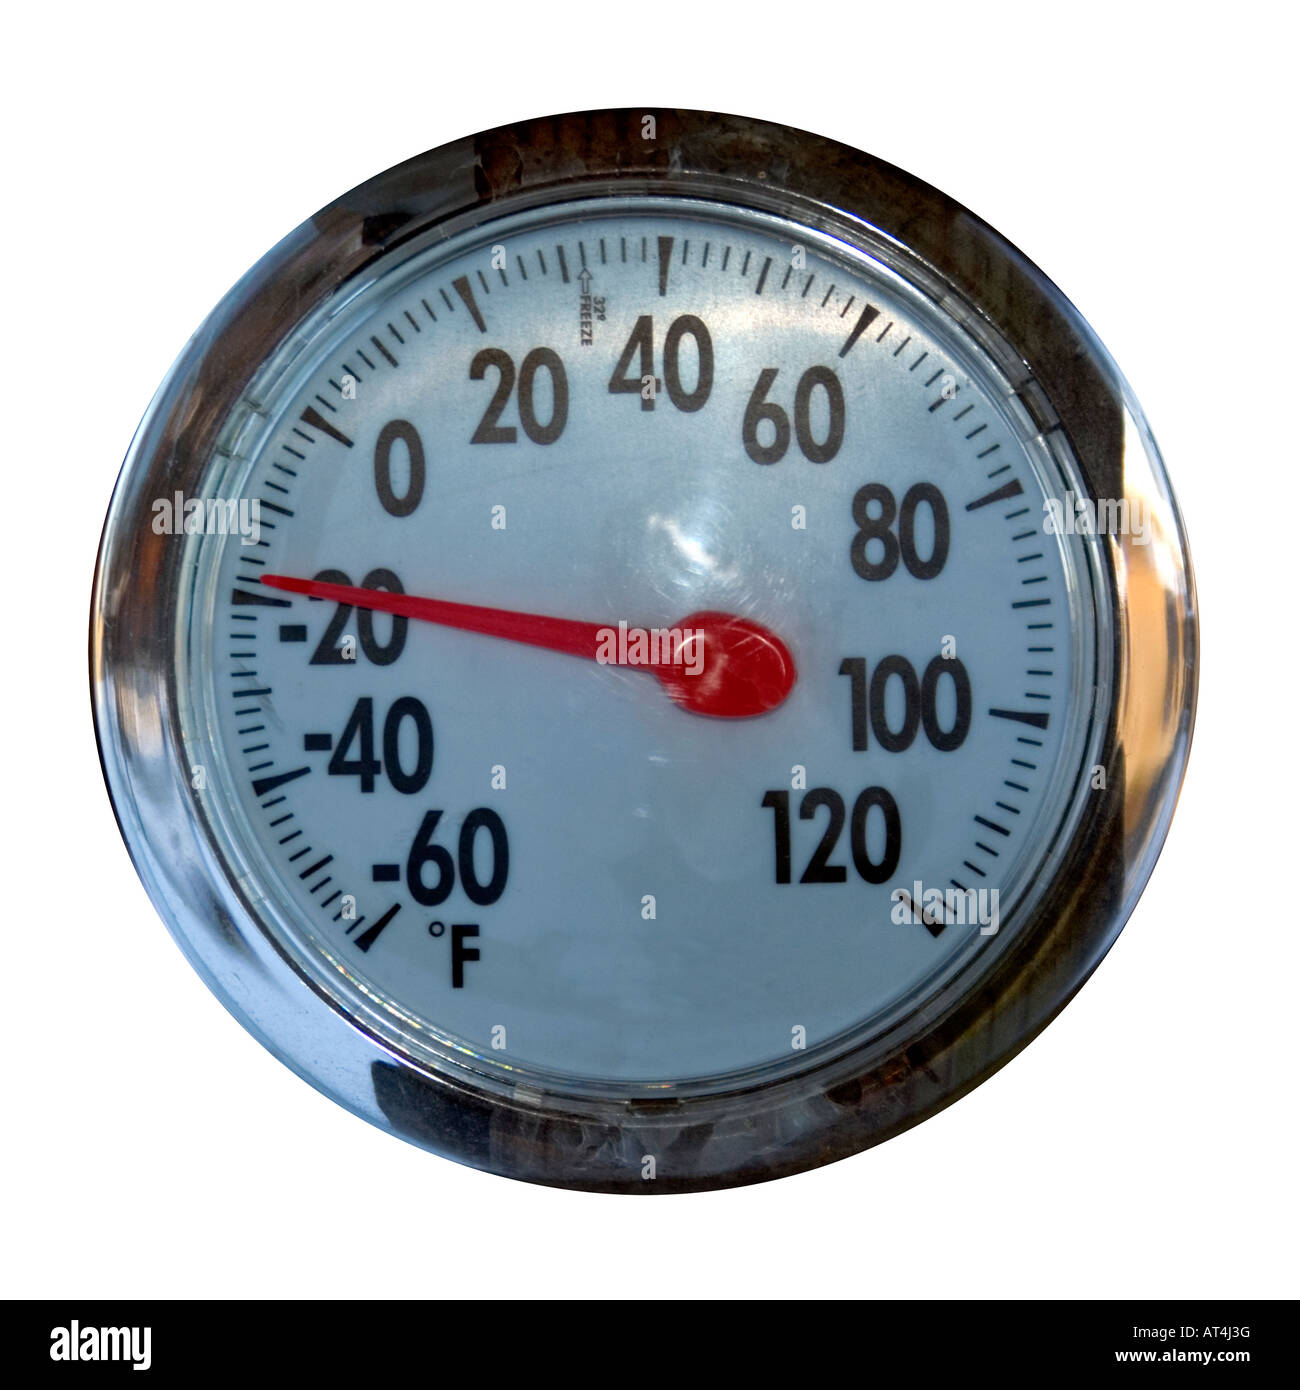 19 degrees farenheit to celcius